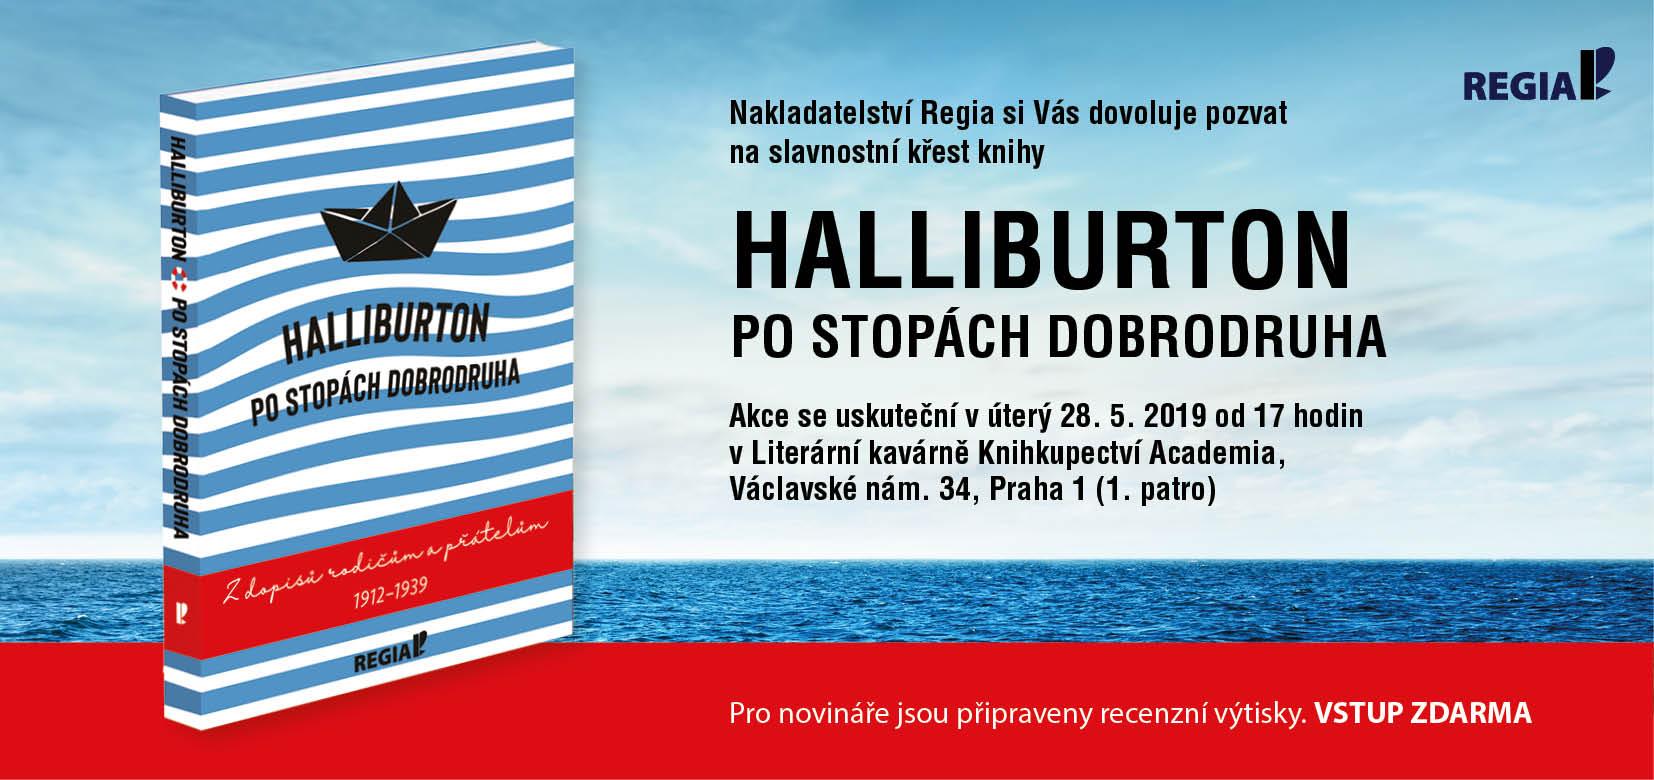 POZVANKA_Halliburton